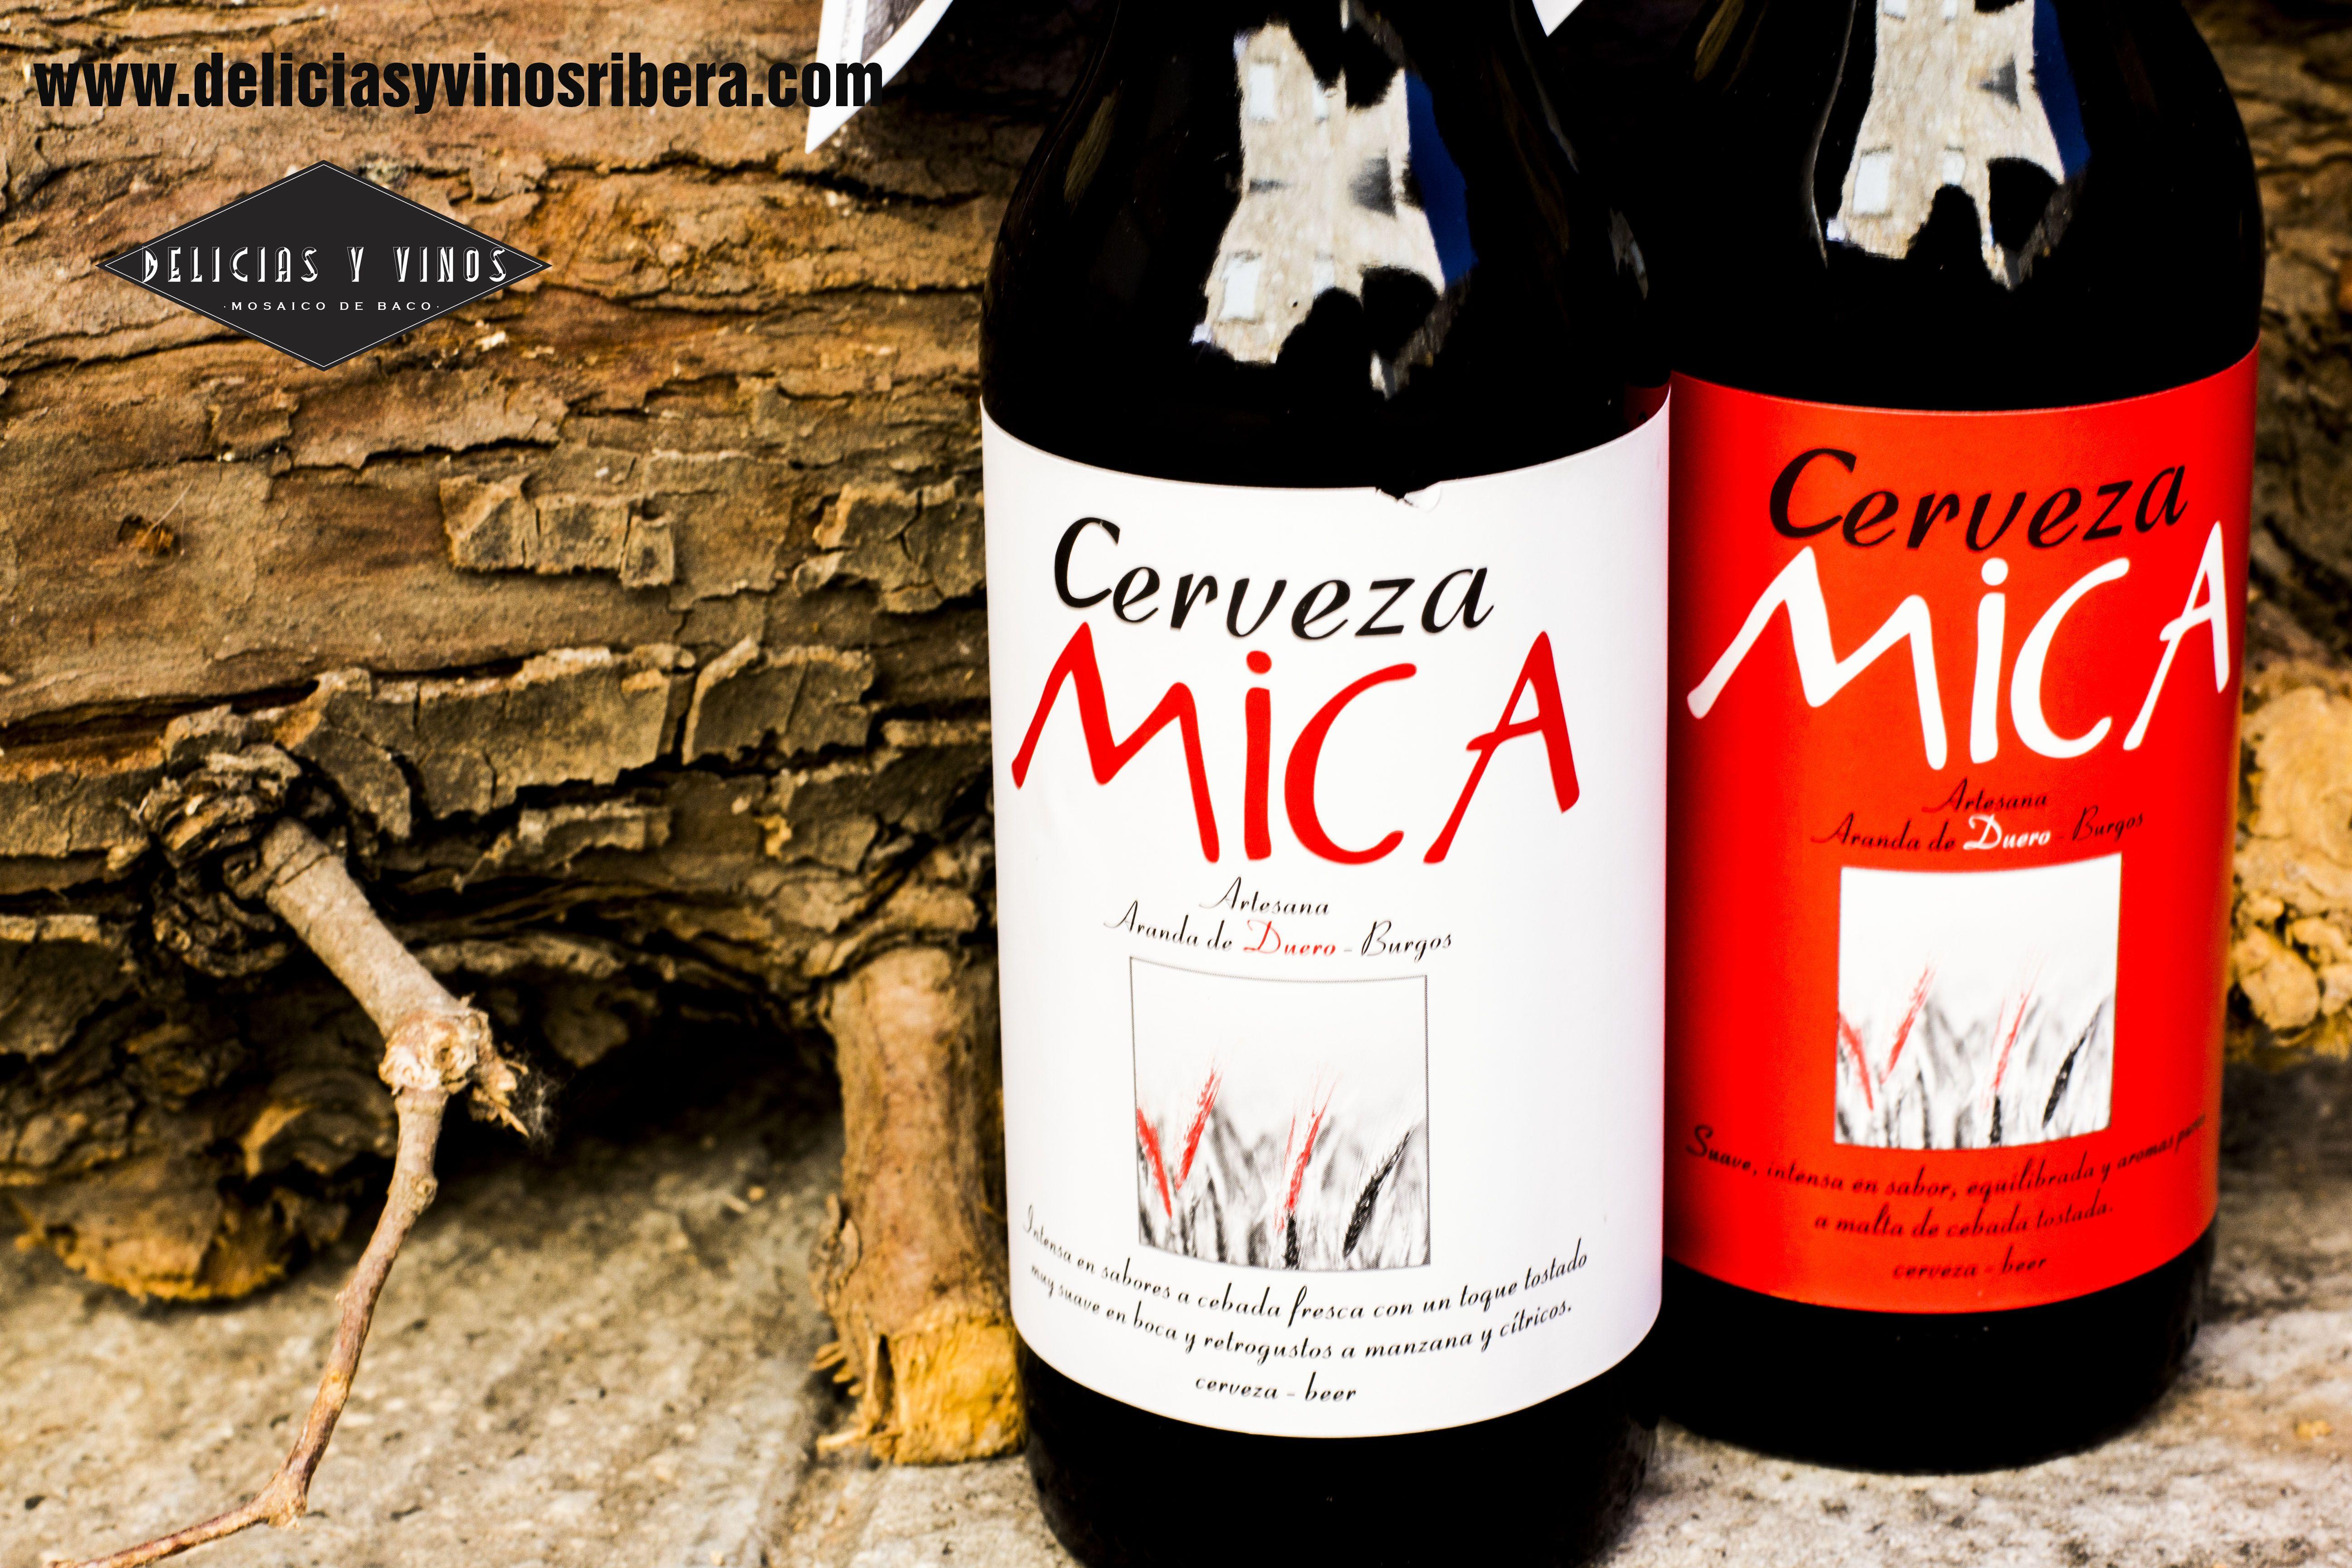 #Cerveza #Artesana #Mica #RiberadelDuero #Fuentenebro #ArandadeDuero